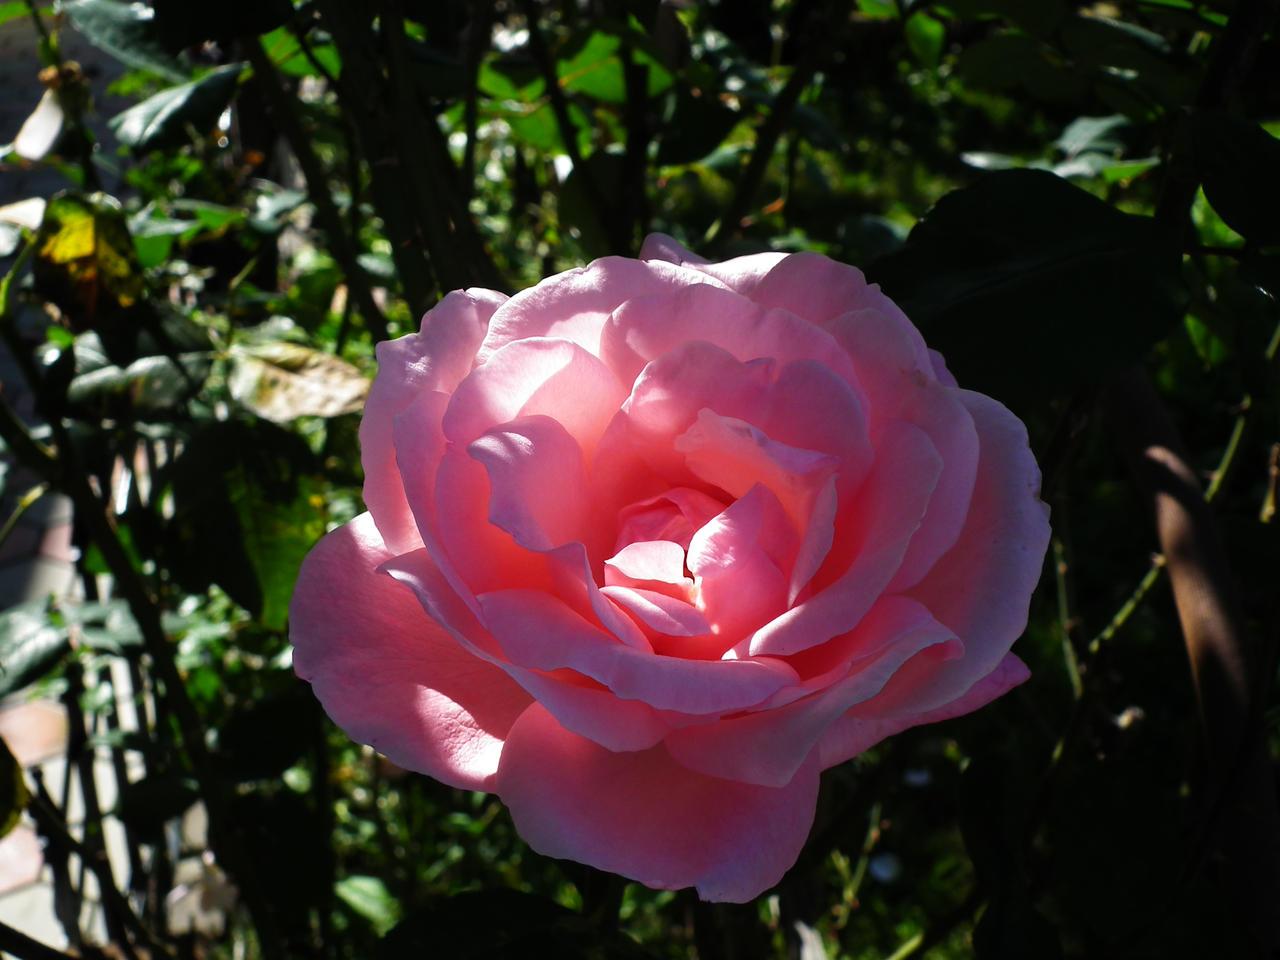 Pink Rose by Sadguardian